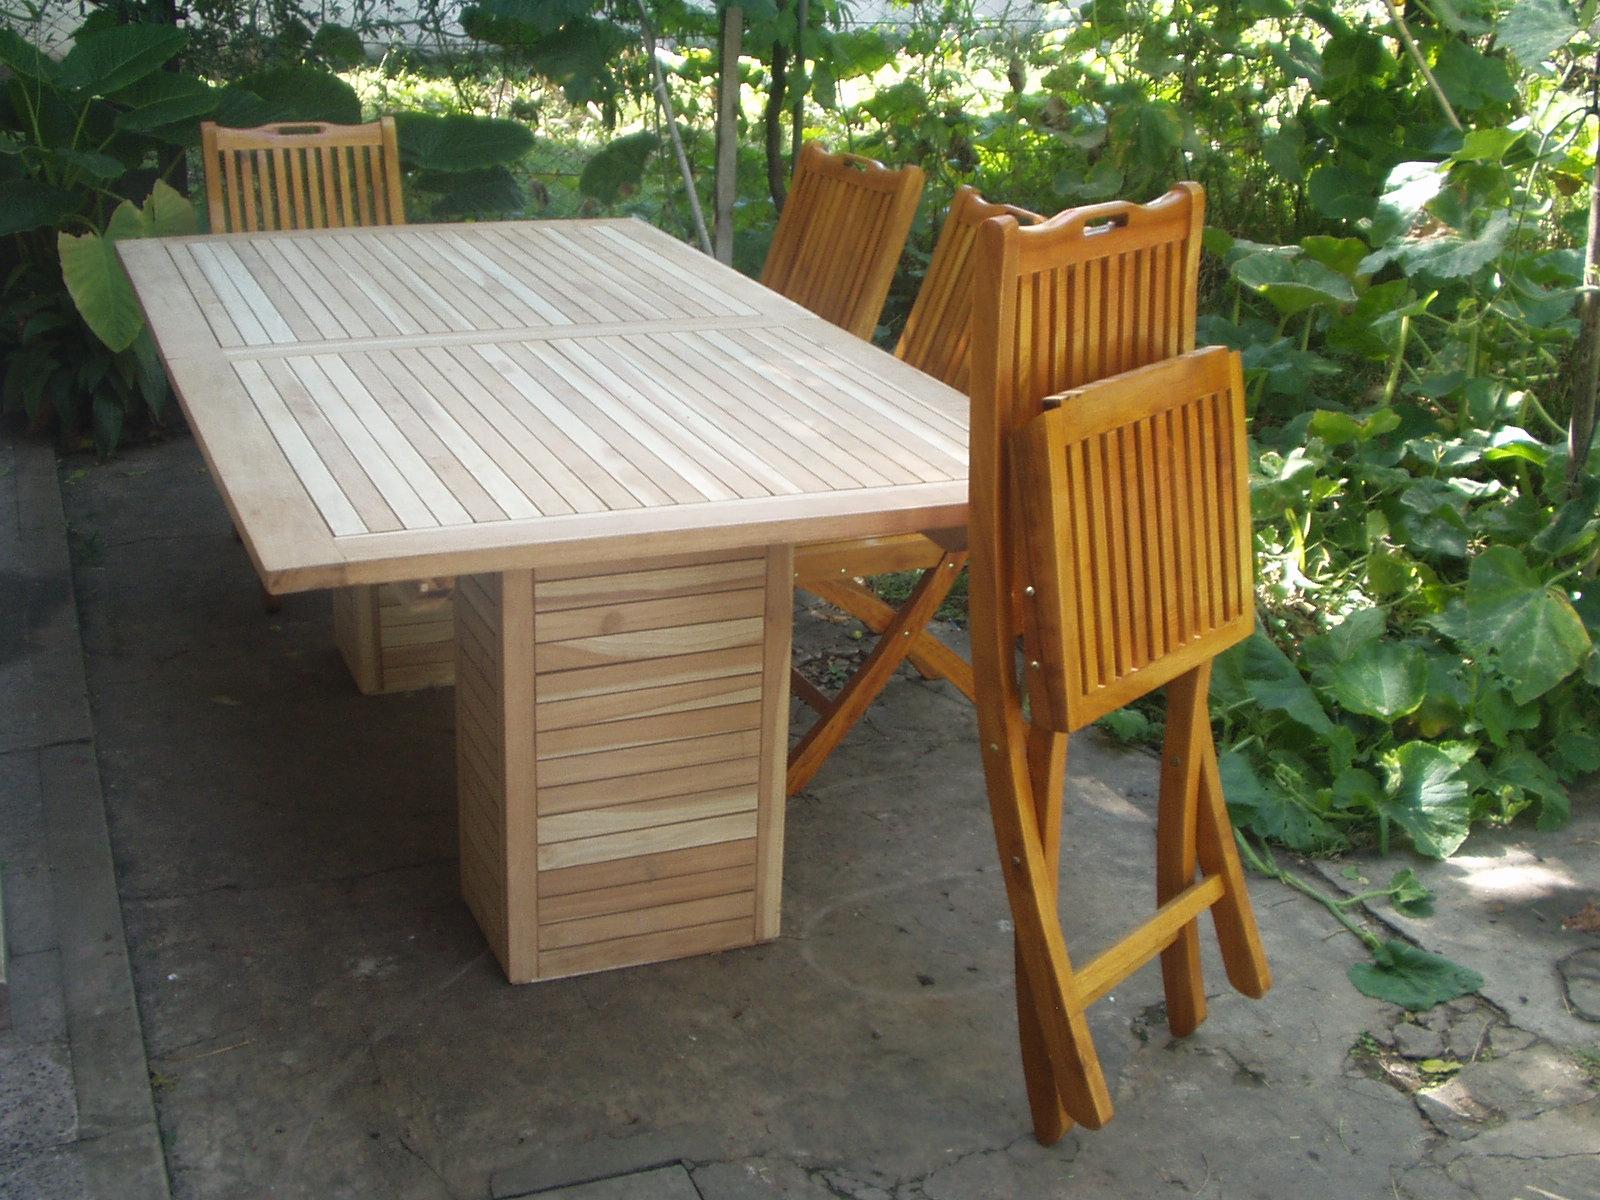 Maderas y muebles amadeus mesa con base caj n obe a for Amadeus muebles